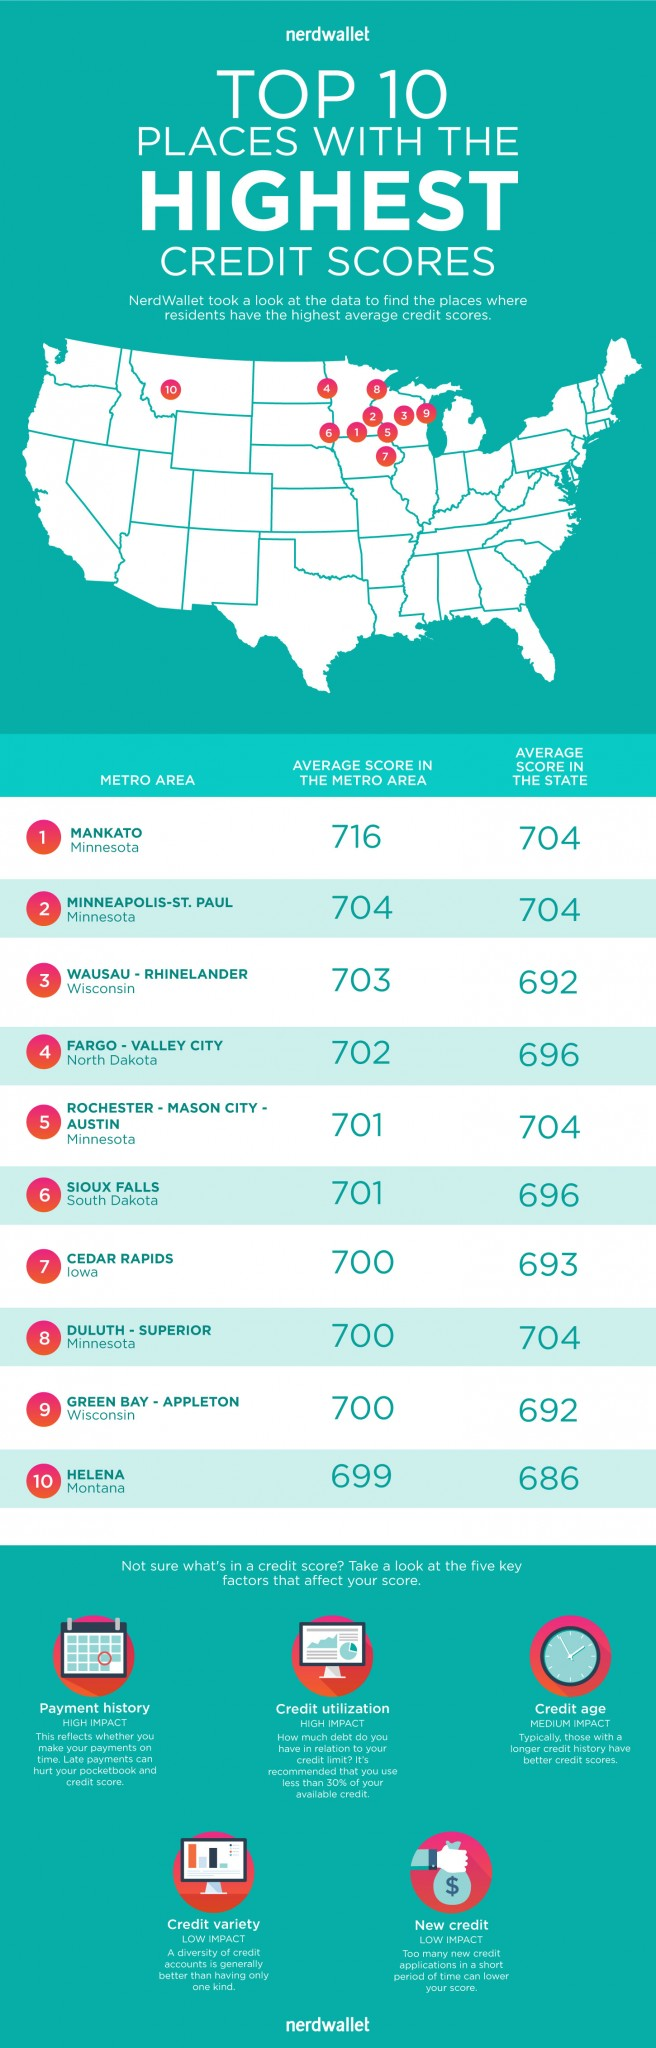 620 Credit Score >> Credit Scores Across America - NerdWallet